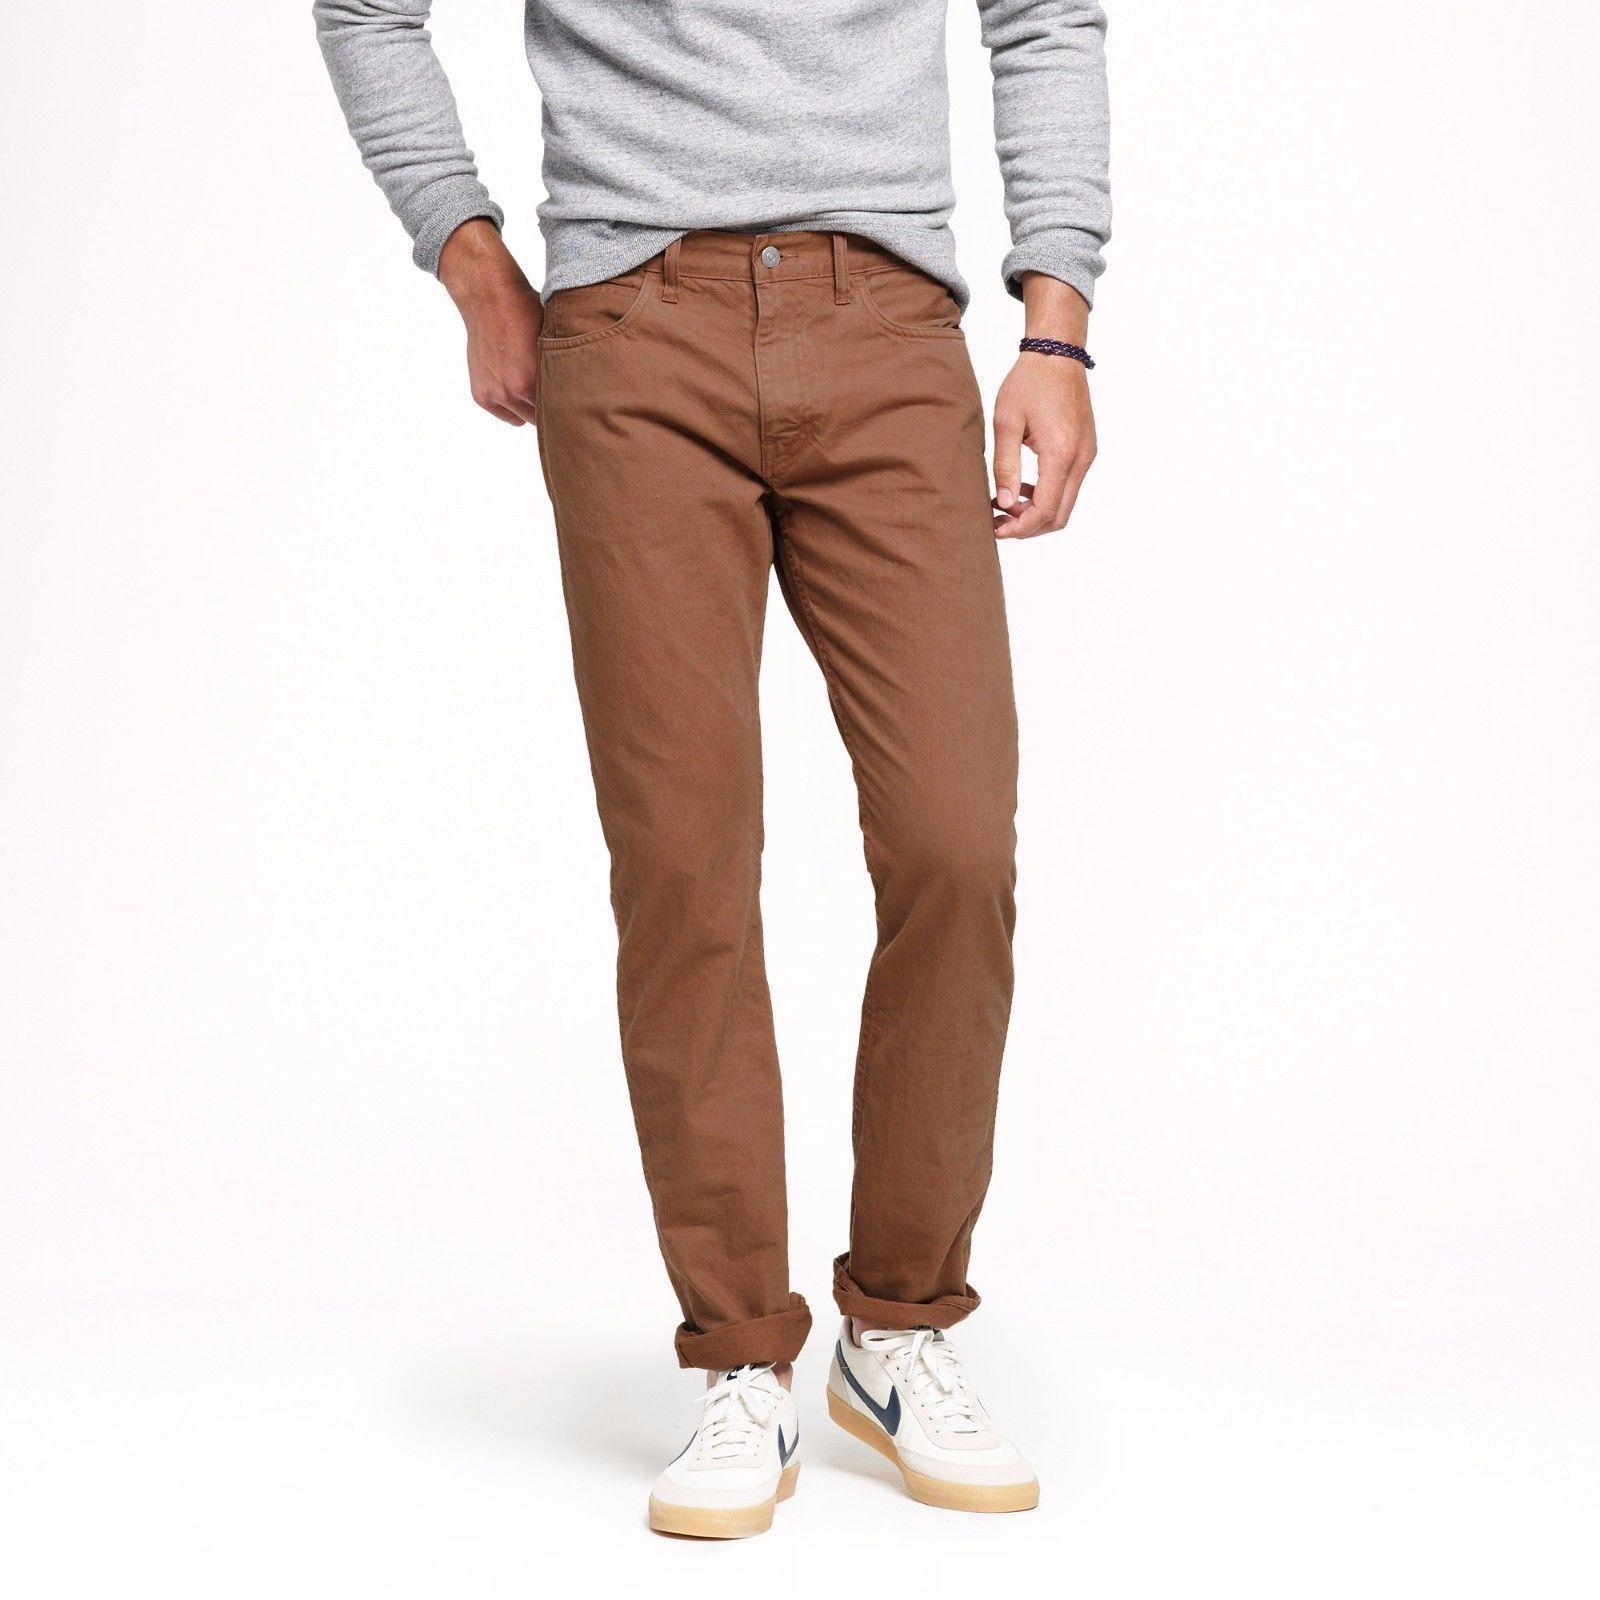 293753a15fdfed J.Crew Skinny Jeans Mens 770 Slim Fit Garment-Dyed Low Rise Cotton Denim 29  x 30